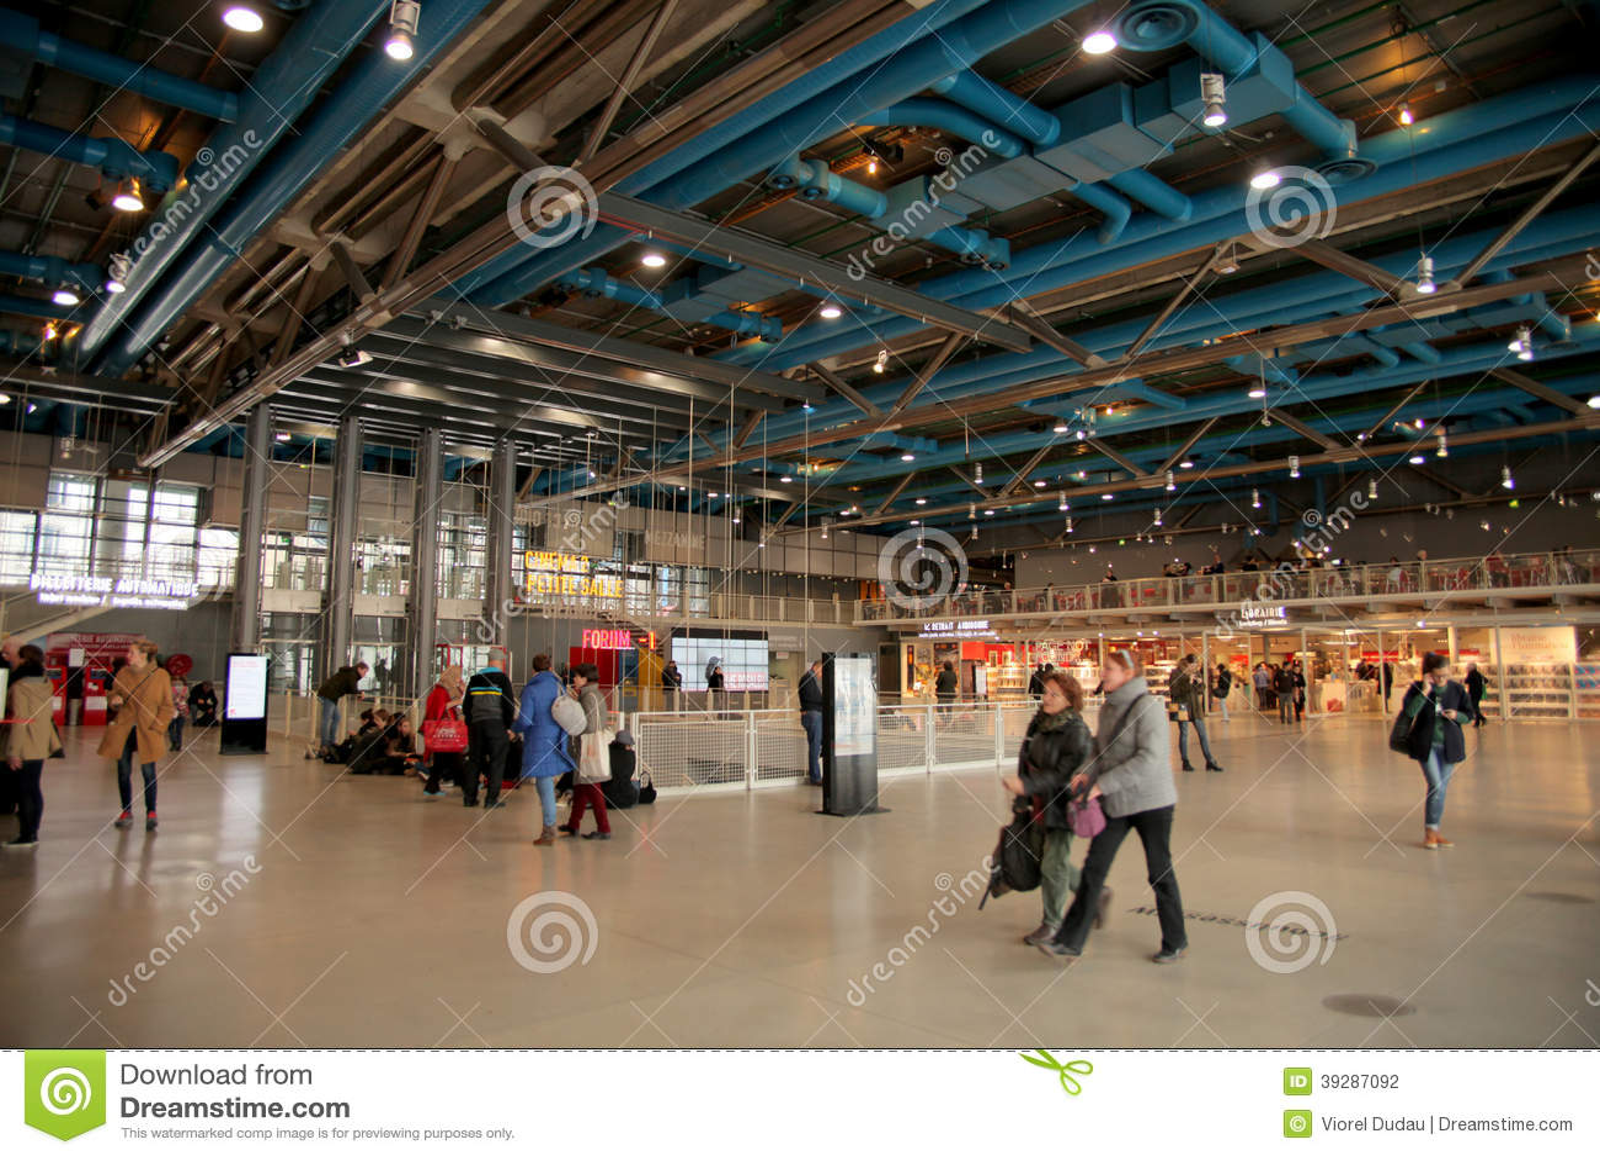 Centre pompidou museum in paris editorial photography - Centre george pompidou architecture ...